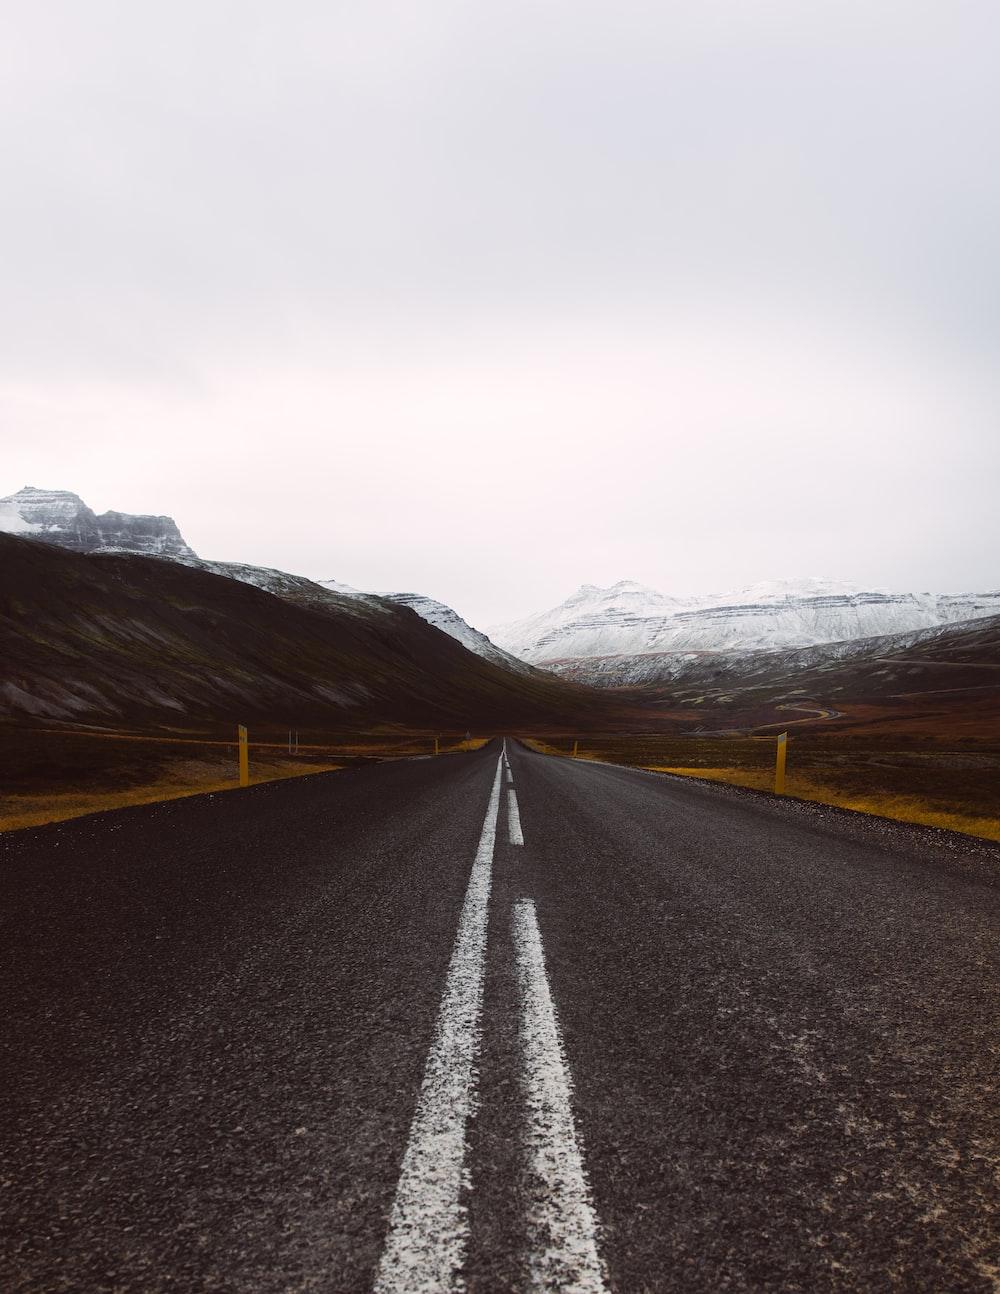 gray asphalt road under cloudy sky